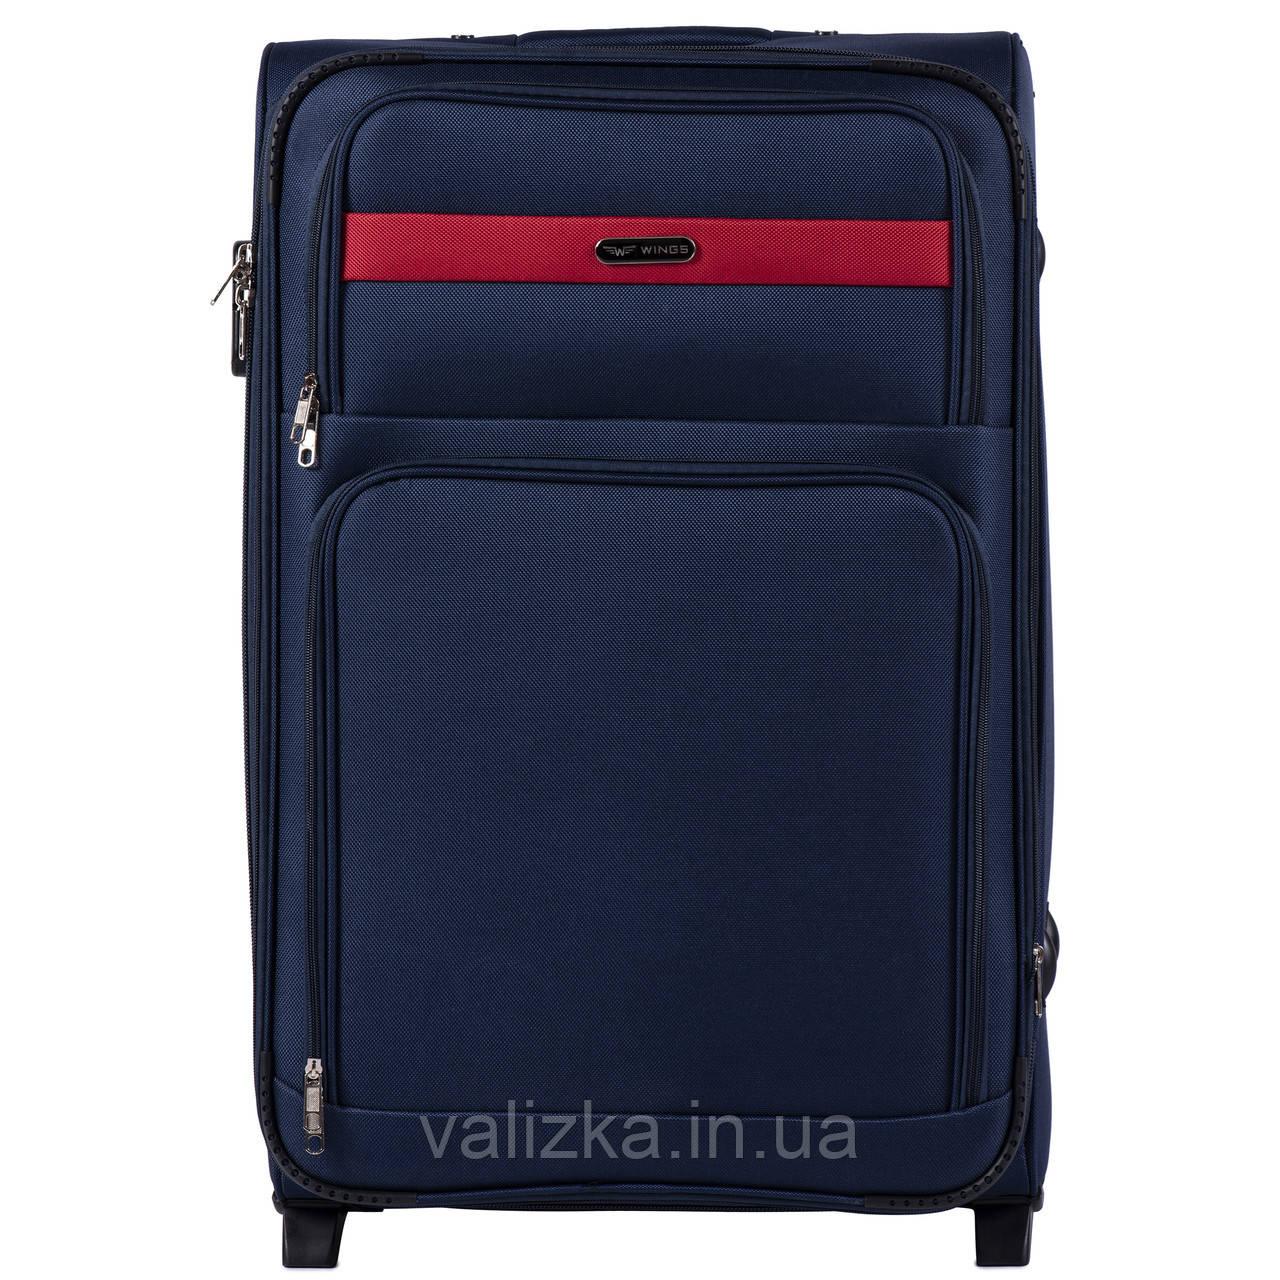 Большой текстильный чемодан синий на 2-х колесах  Wings 1605